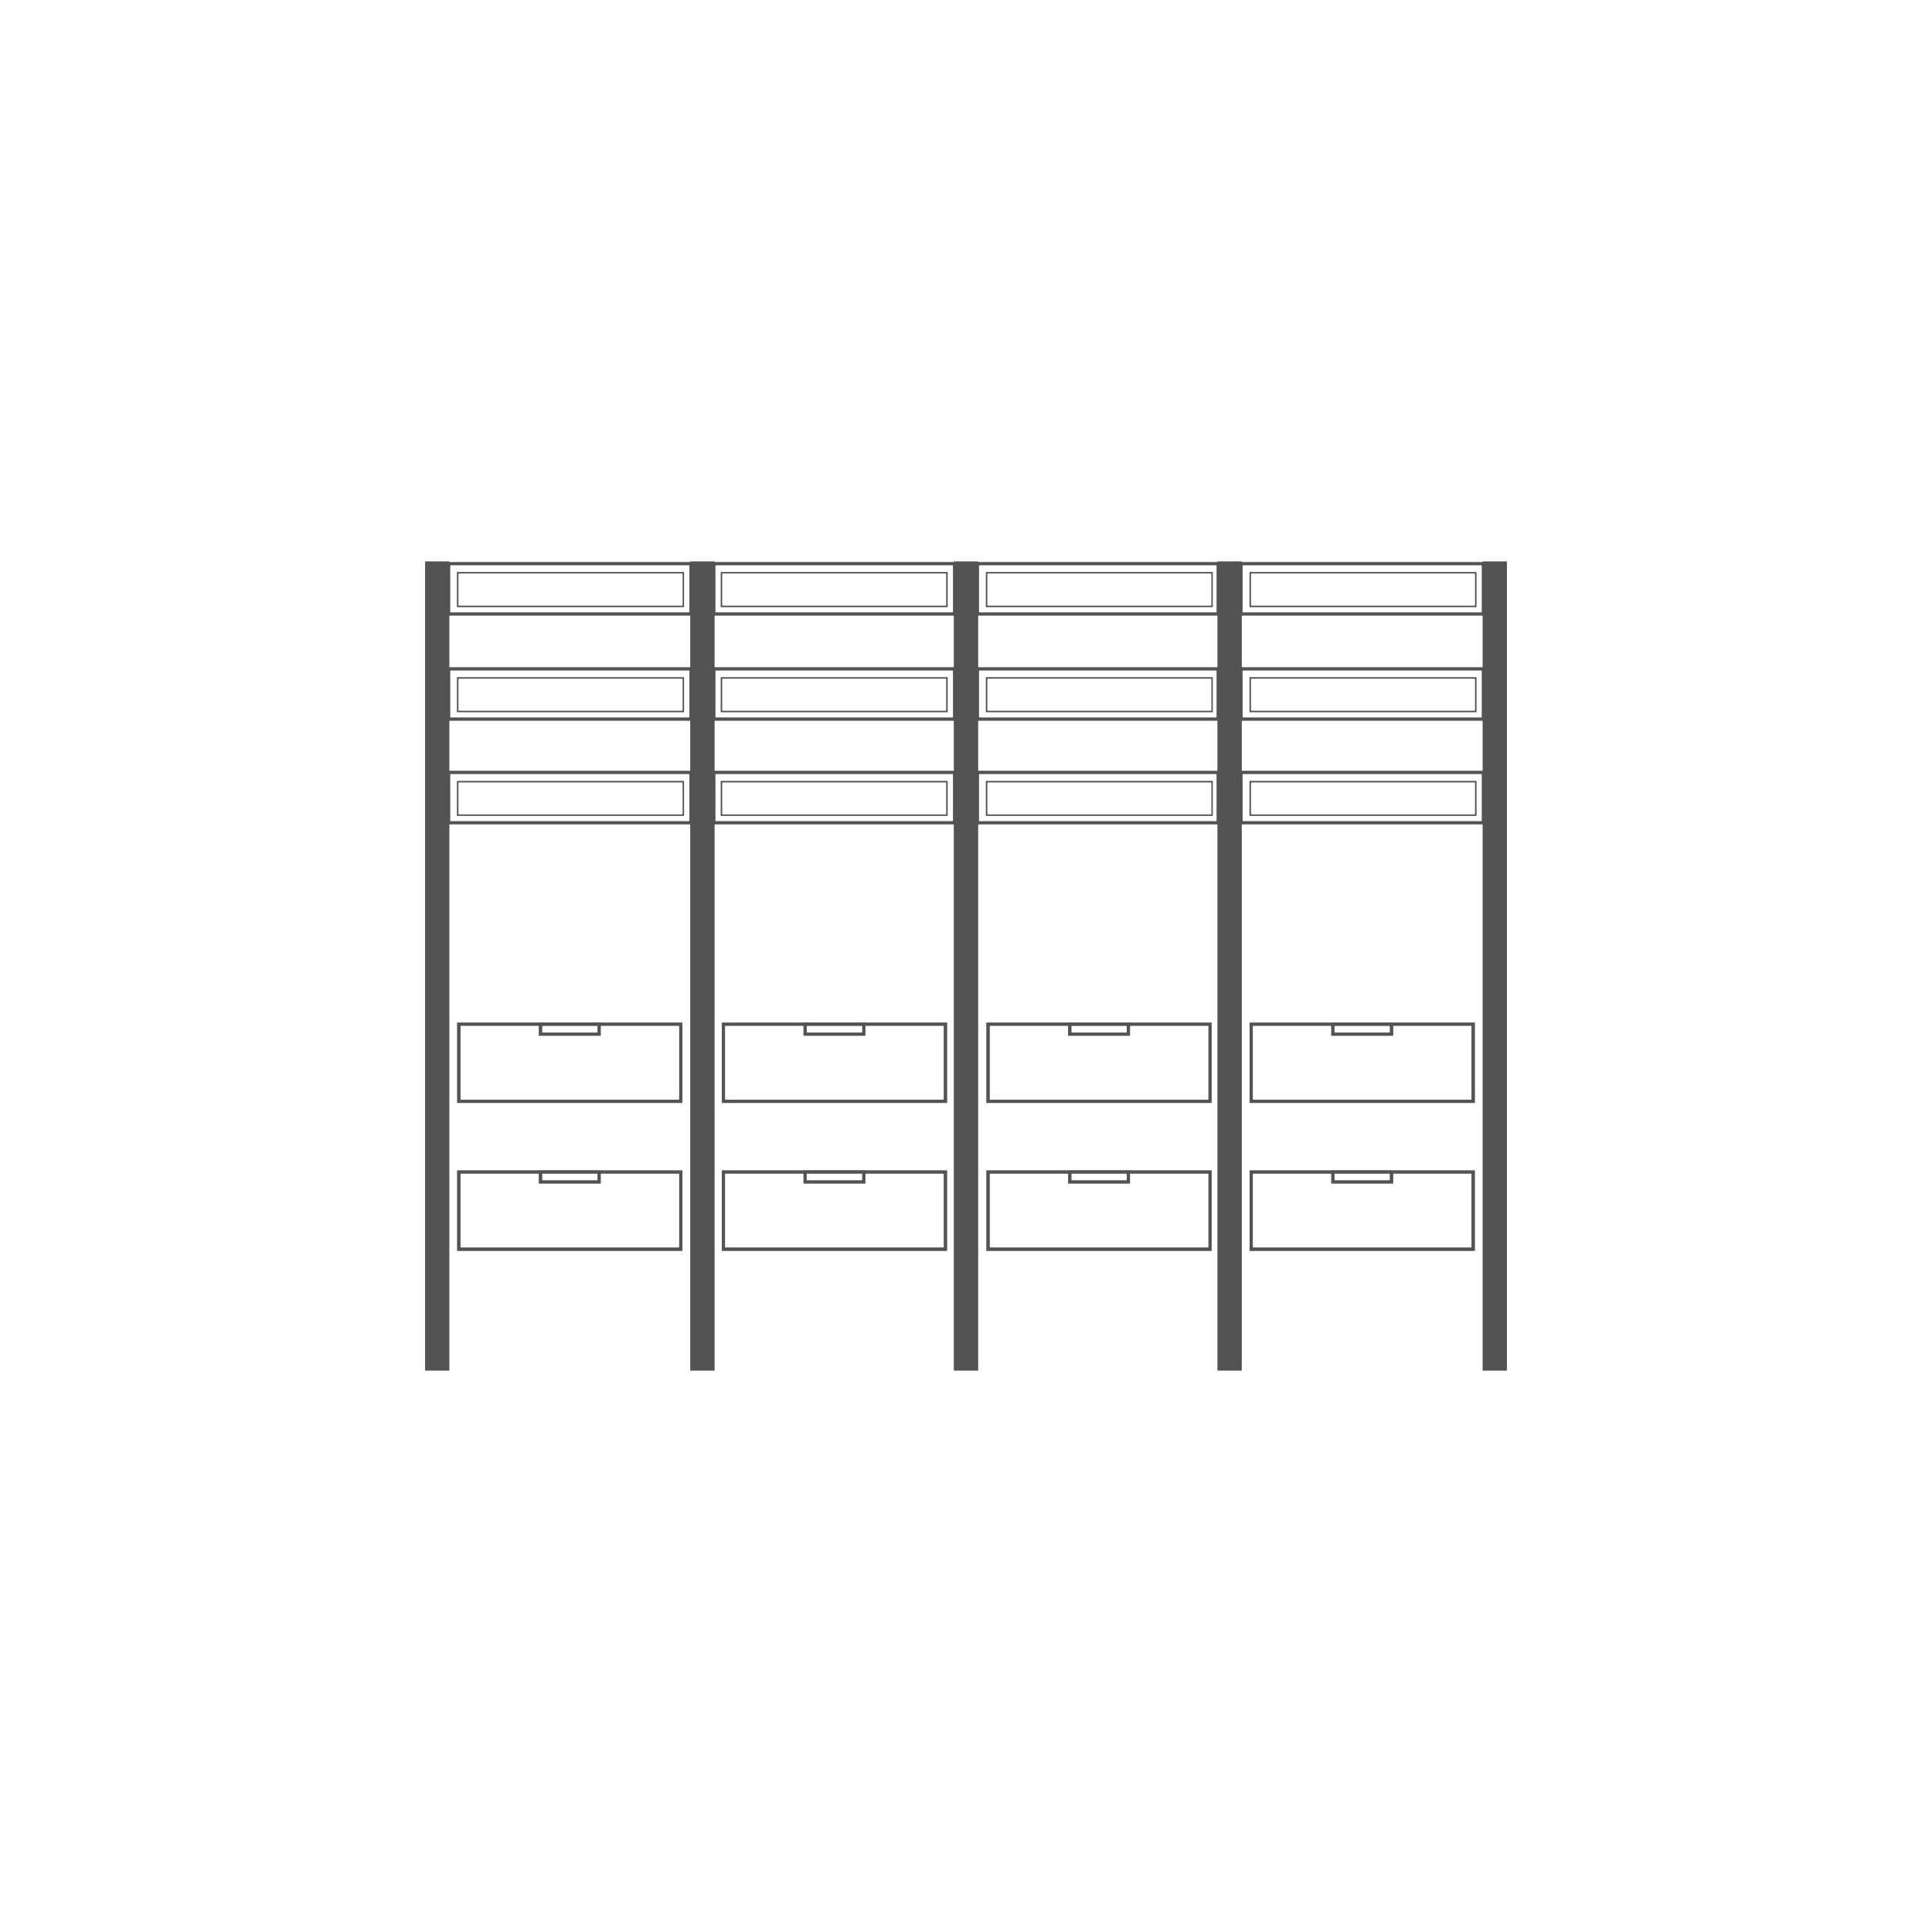 lumber center outline-01.png